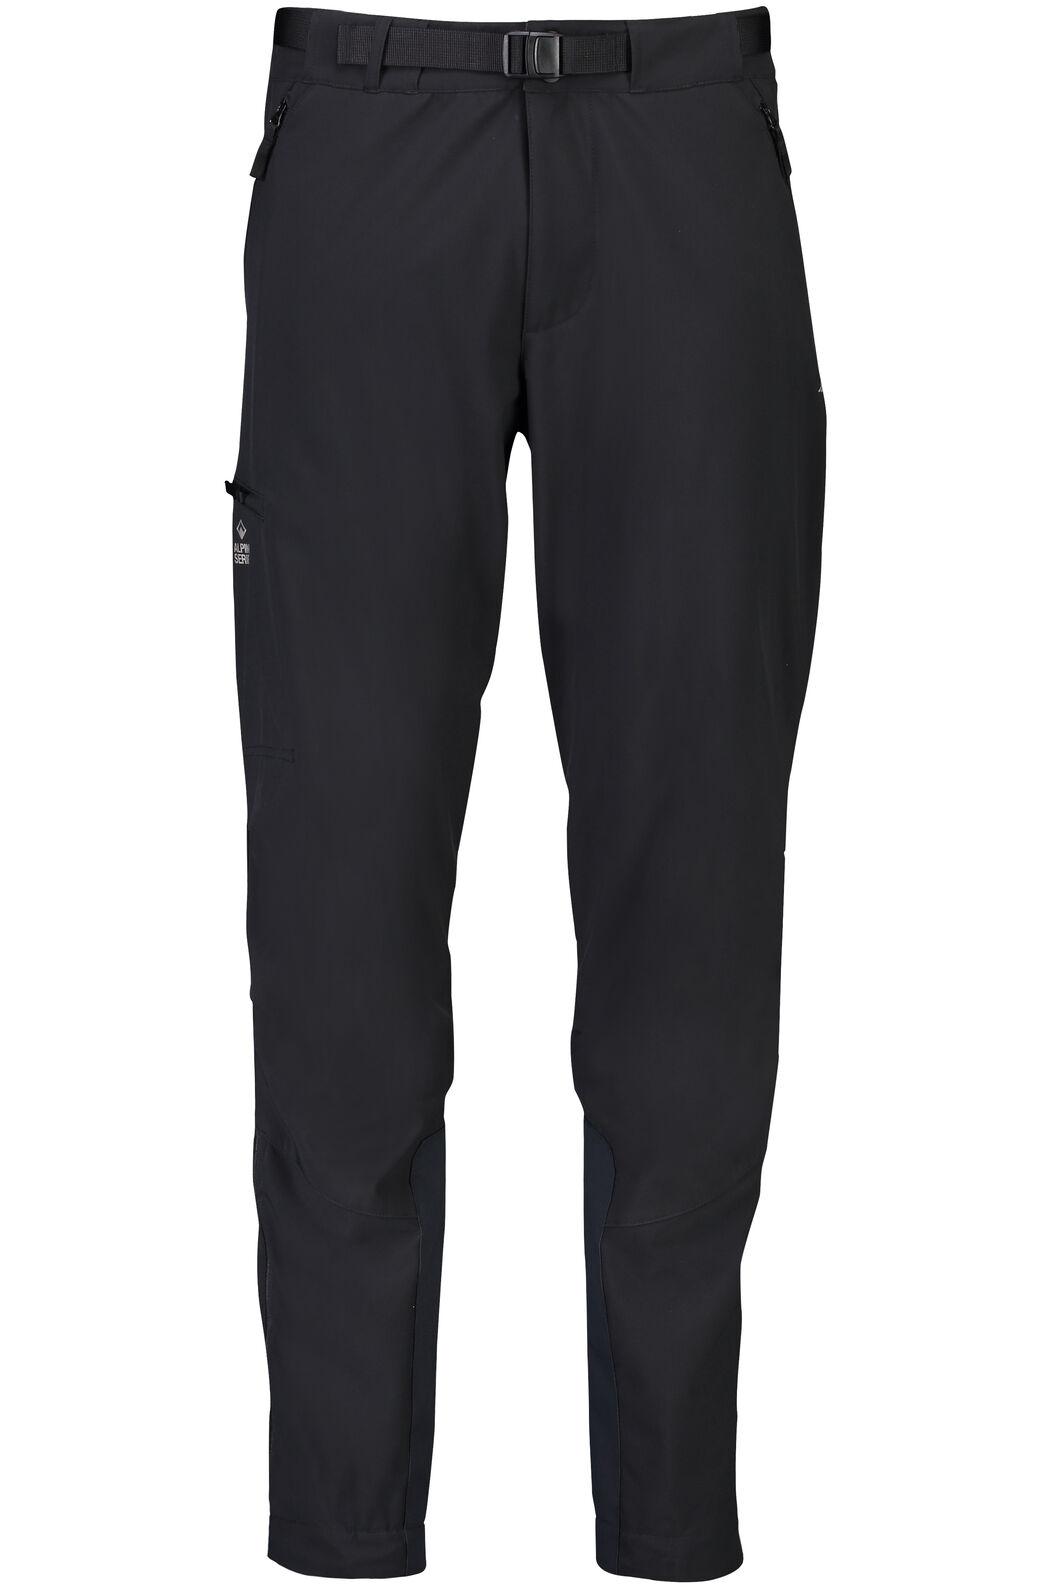 Macpac Fitzroy Alpine Series Softshell Pants — Men's, Black, hi-res